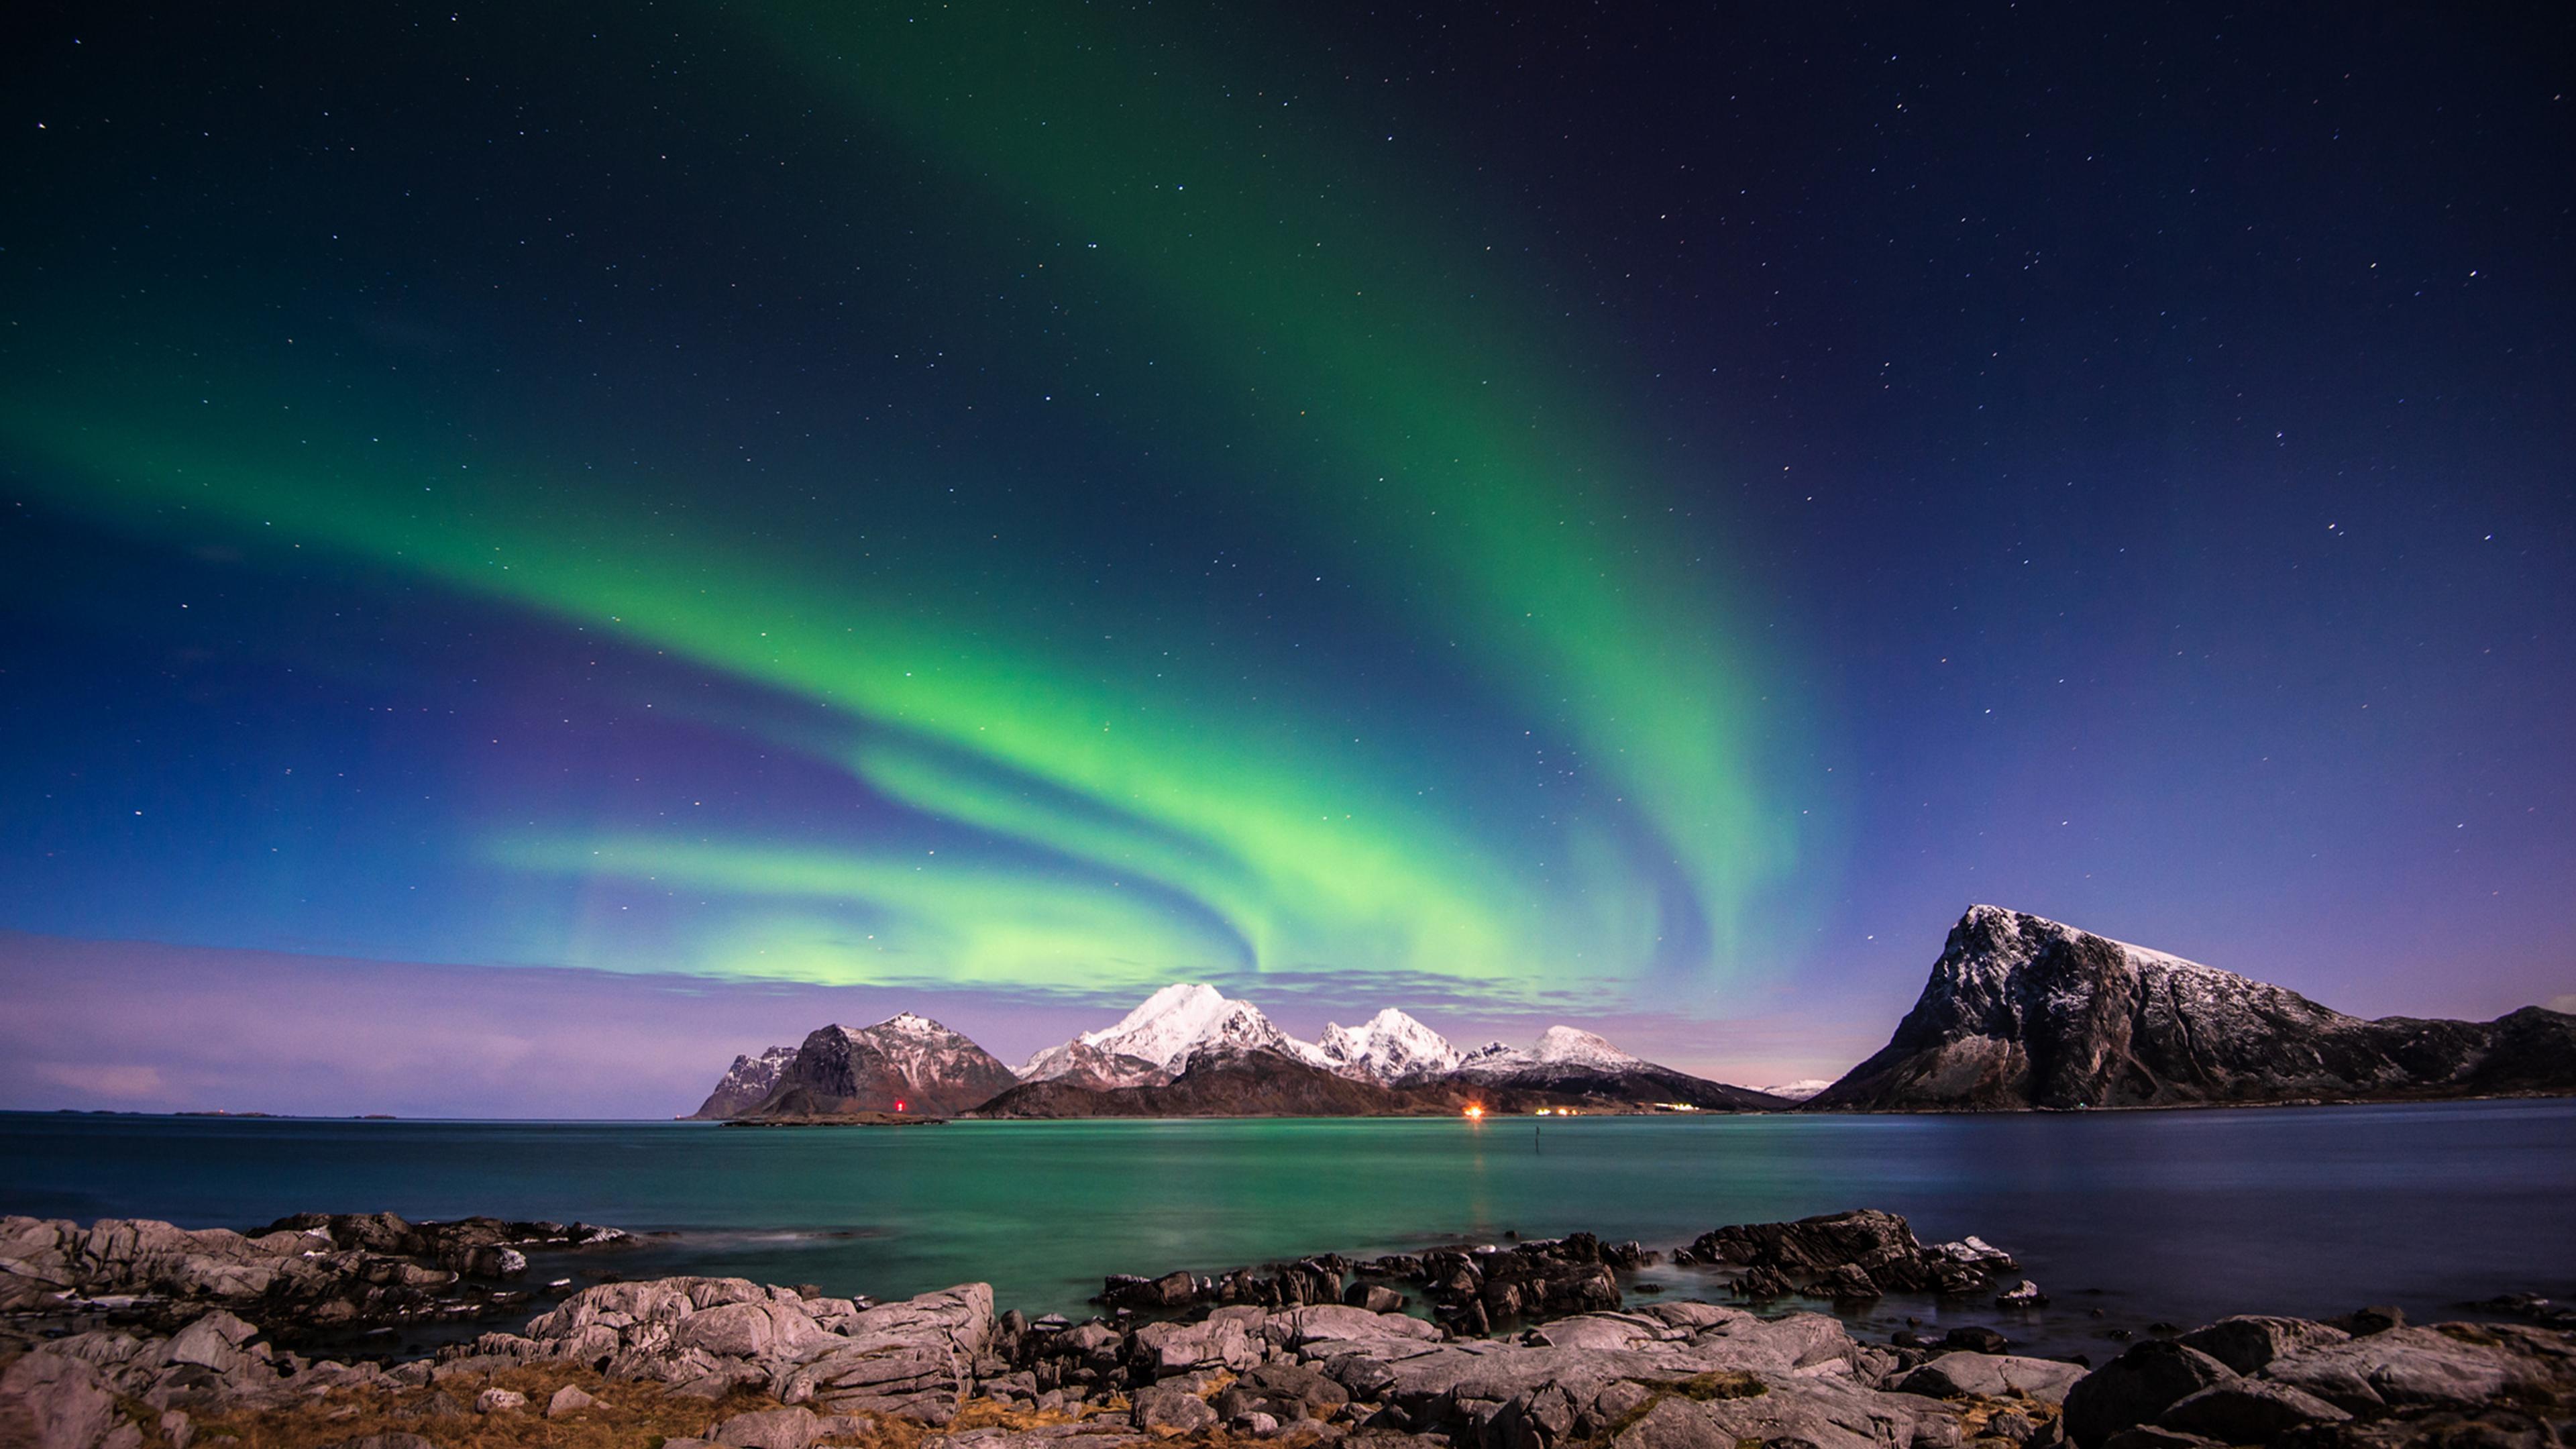 Aurora borealis 4k ultra hd wallpaper background image - Desktop wallpaper 4k ultra hd ...